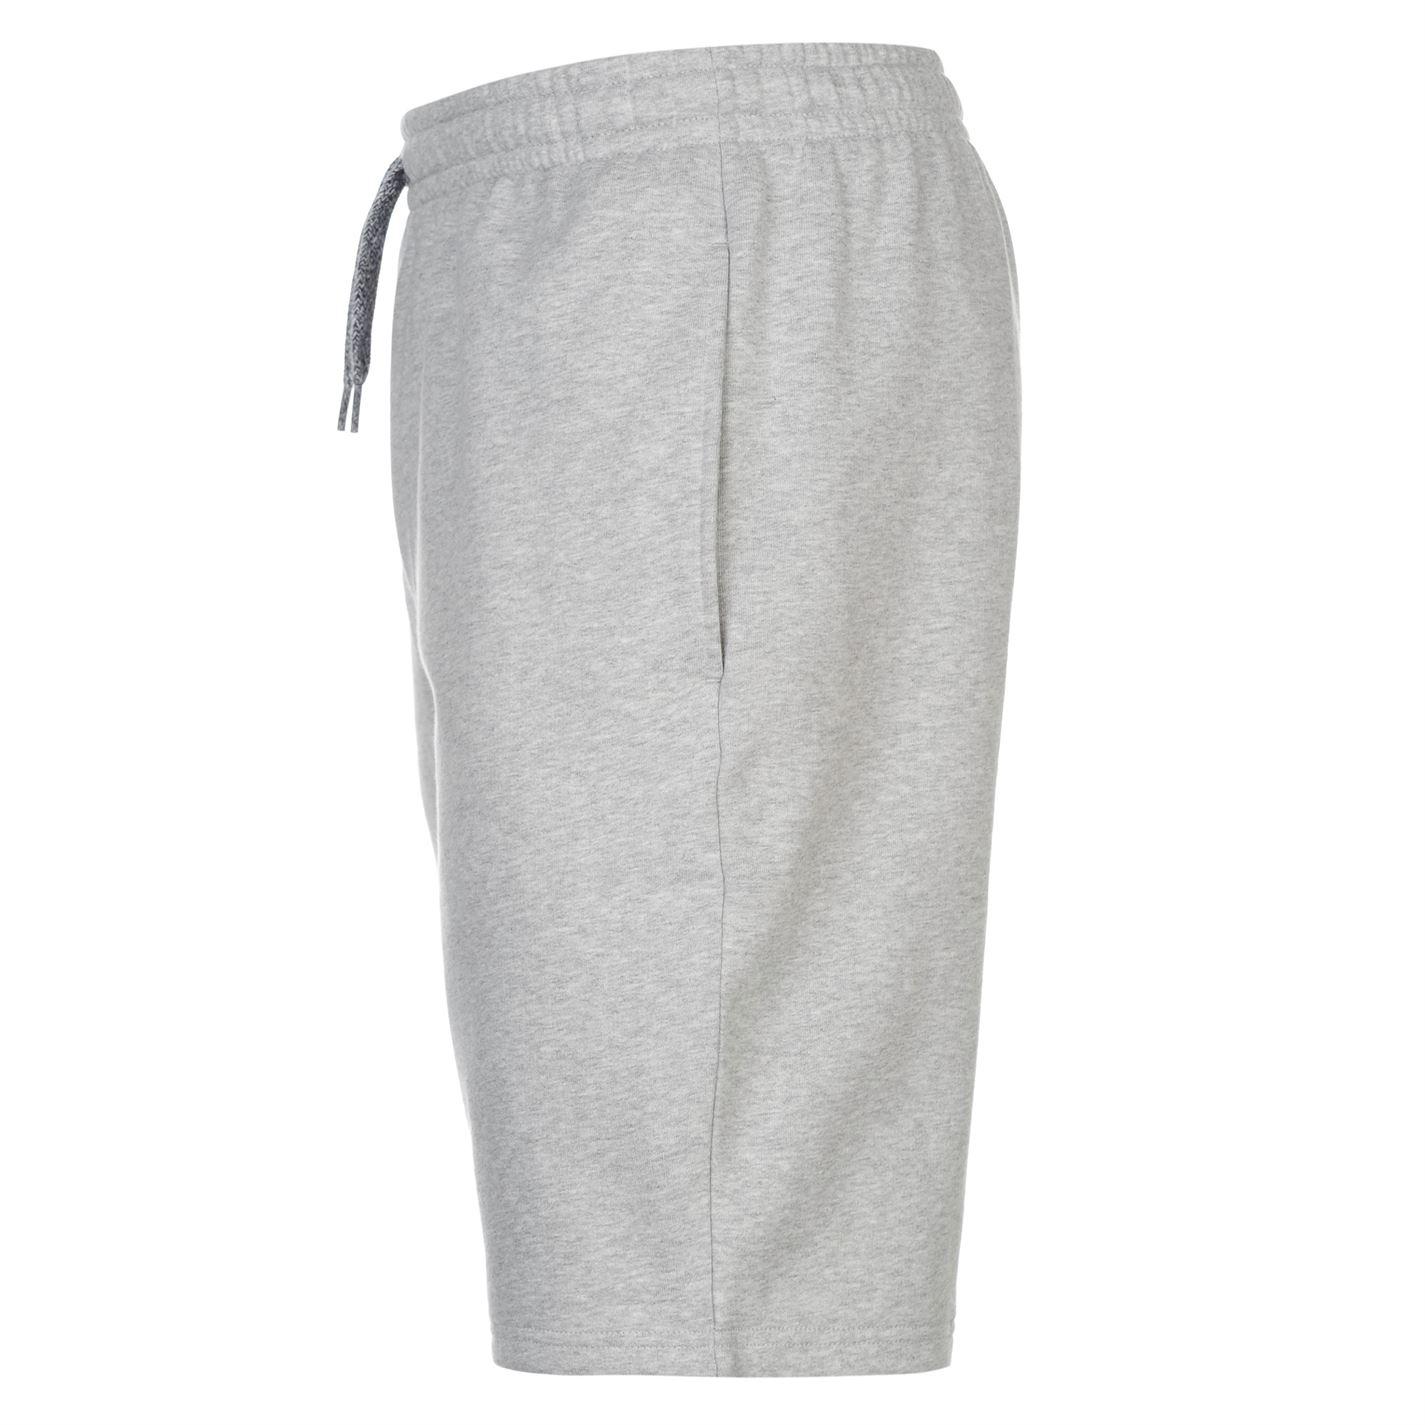 Lacoste-Fleece-Jogger-Shorts-Mens thumbnail 5